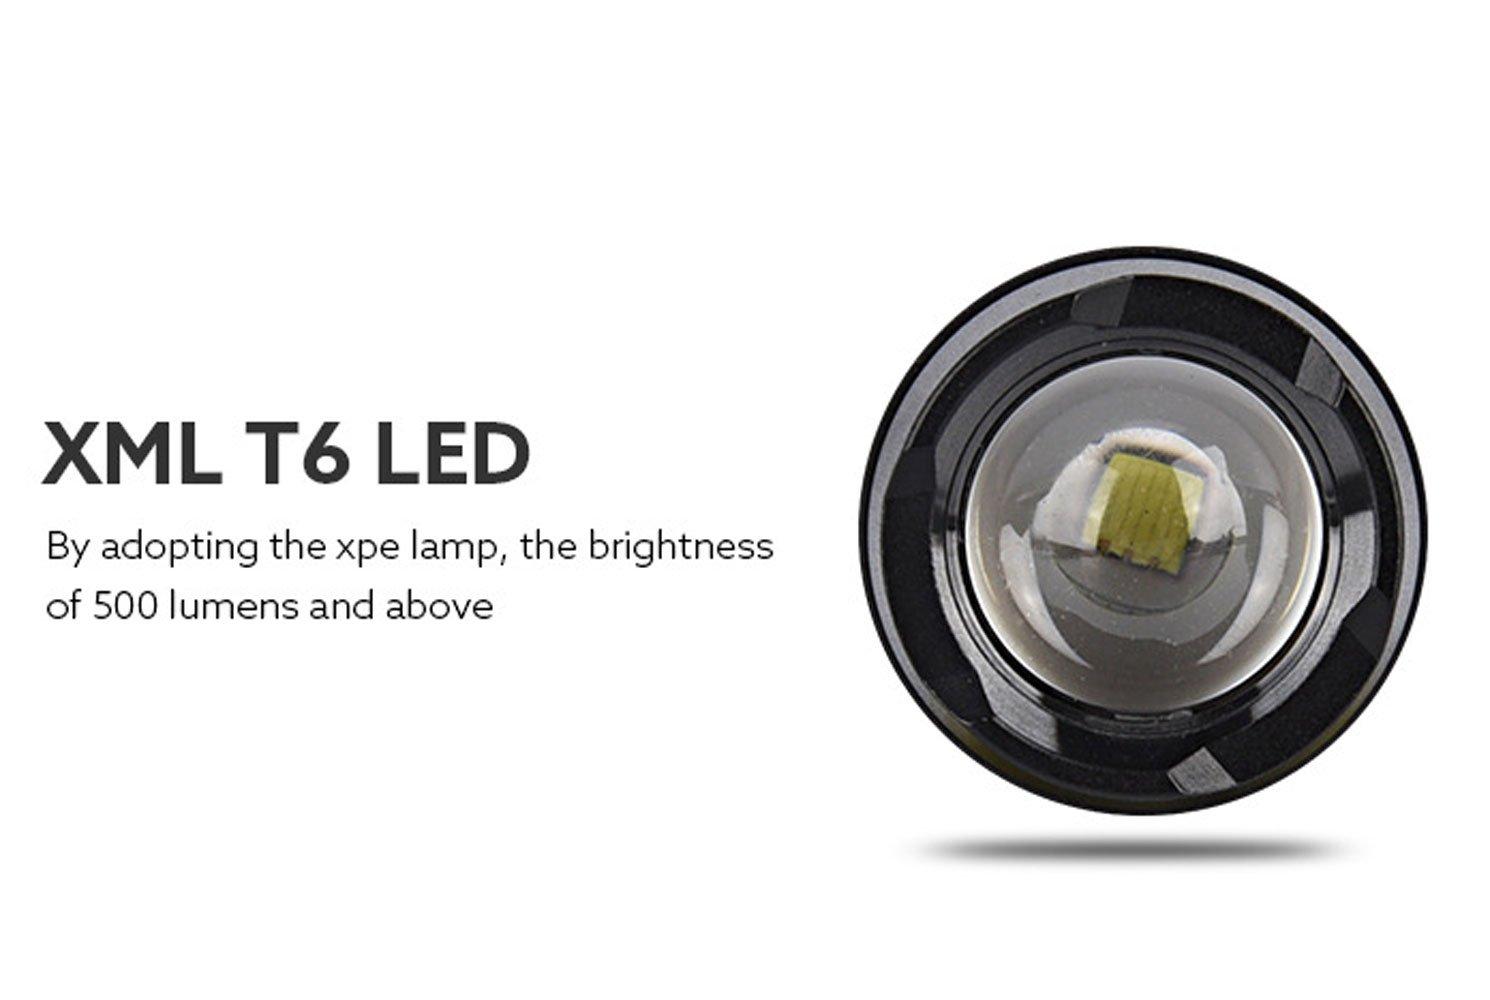 518740136b5 ... GXWFUI Recargable Recargable Recargable USB Linterna LED Ajustable Zoom  Aire Libre Linterna Multifuncional Perfecta para Ciclismo ...